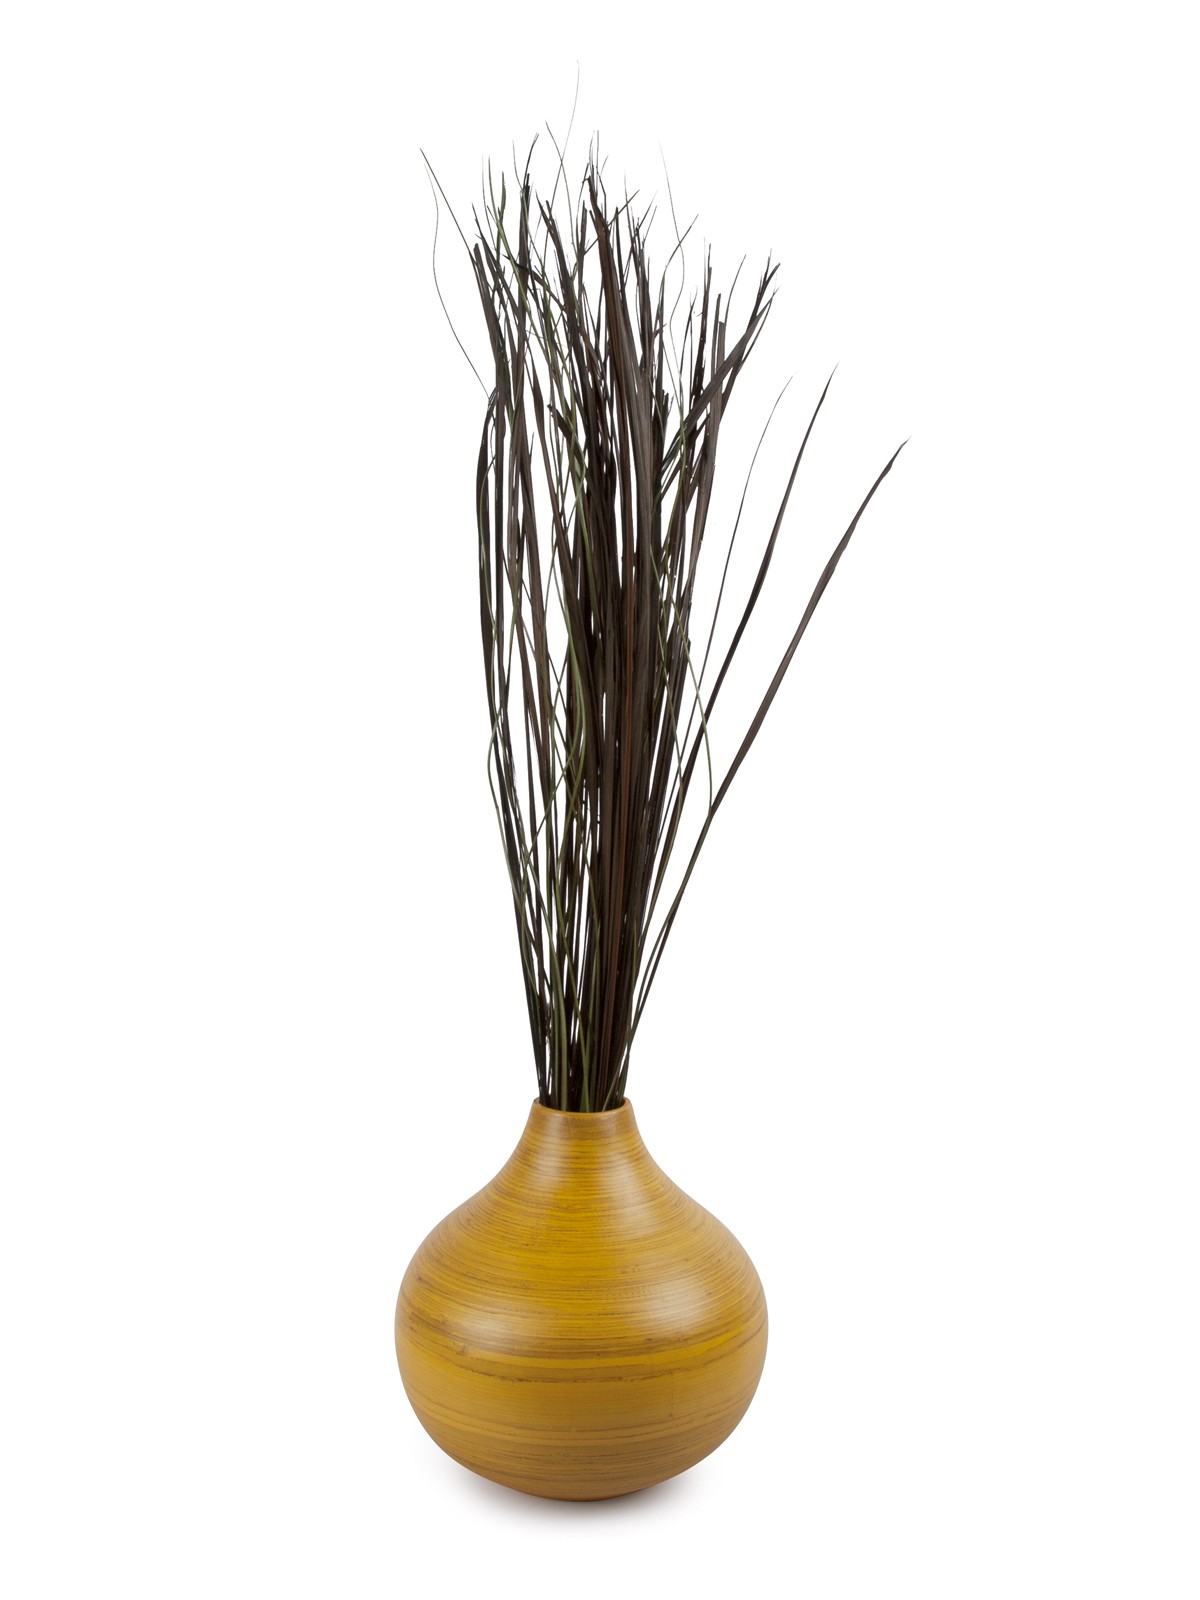 Bamboo Worktops Photos Bamboo Vase